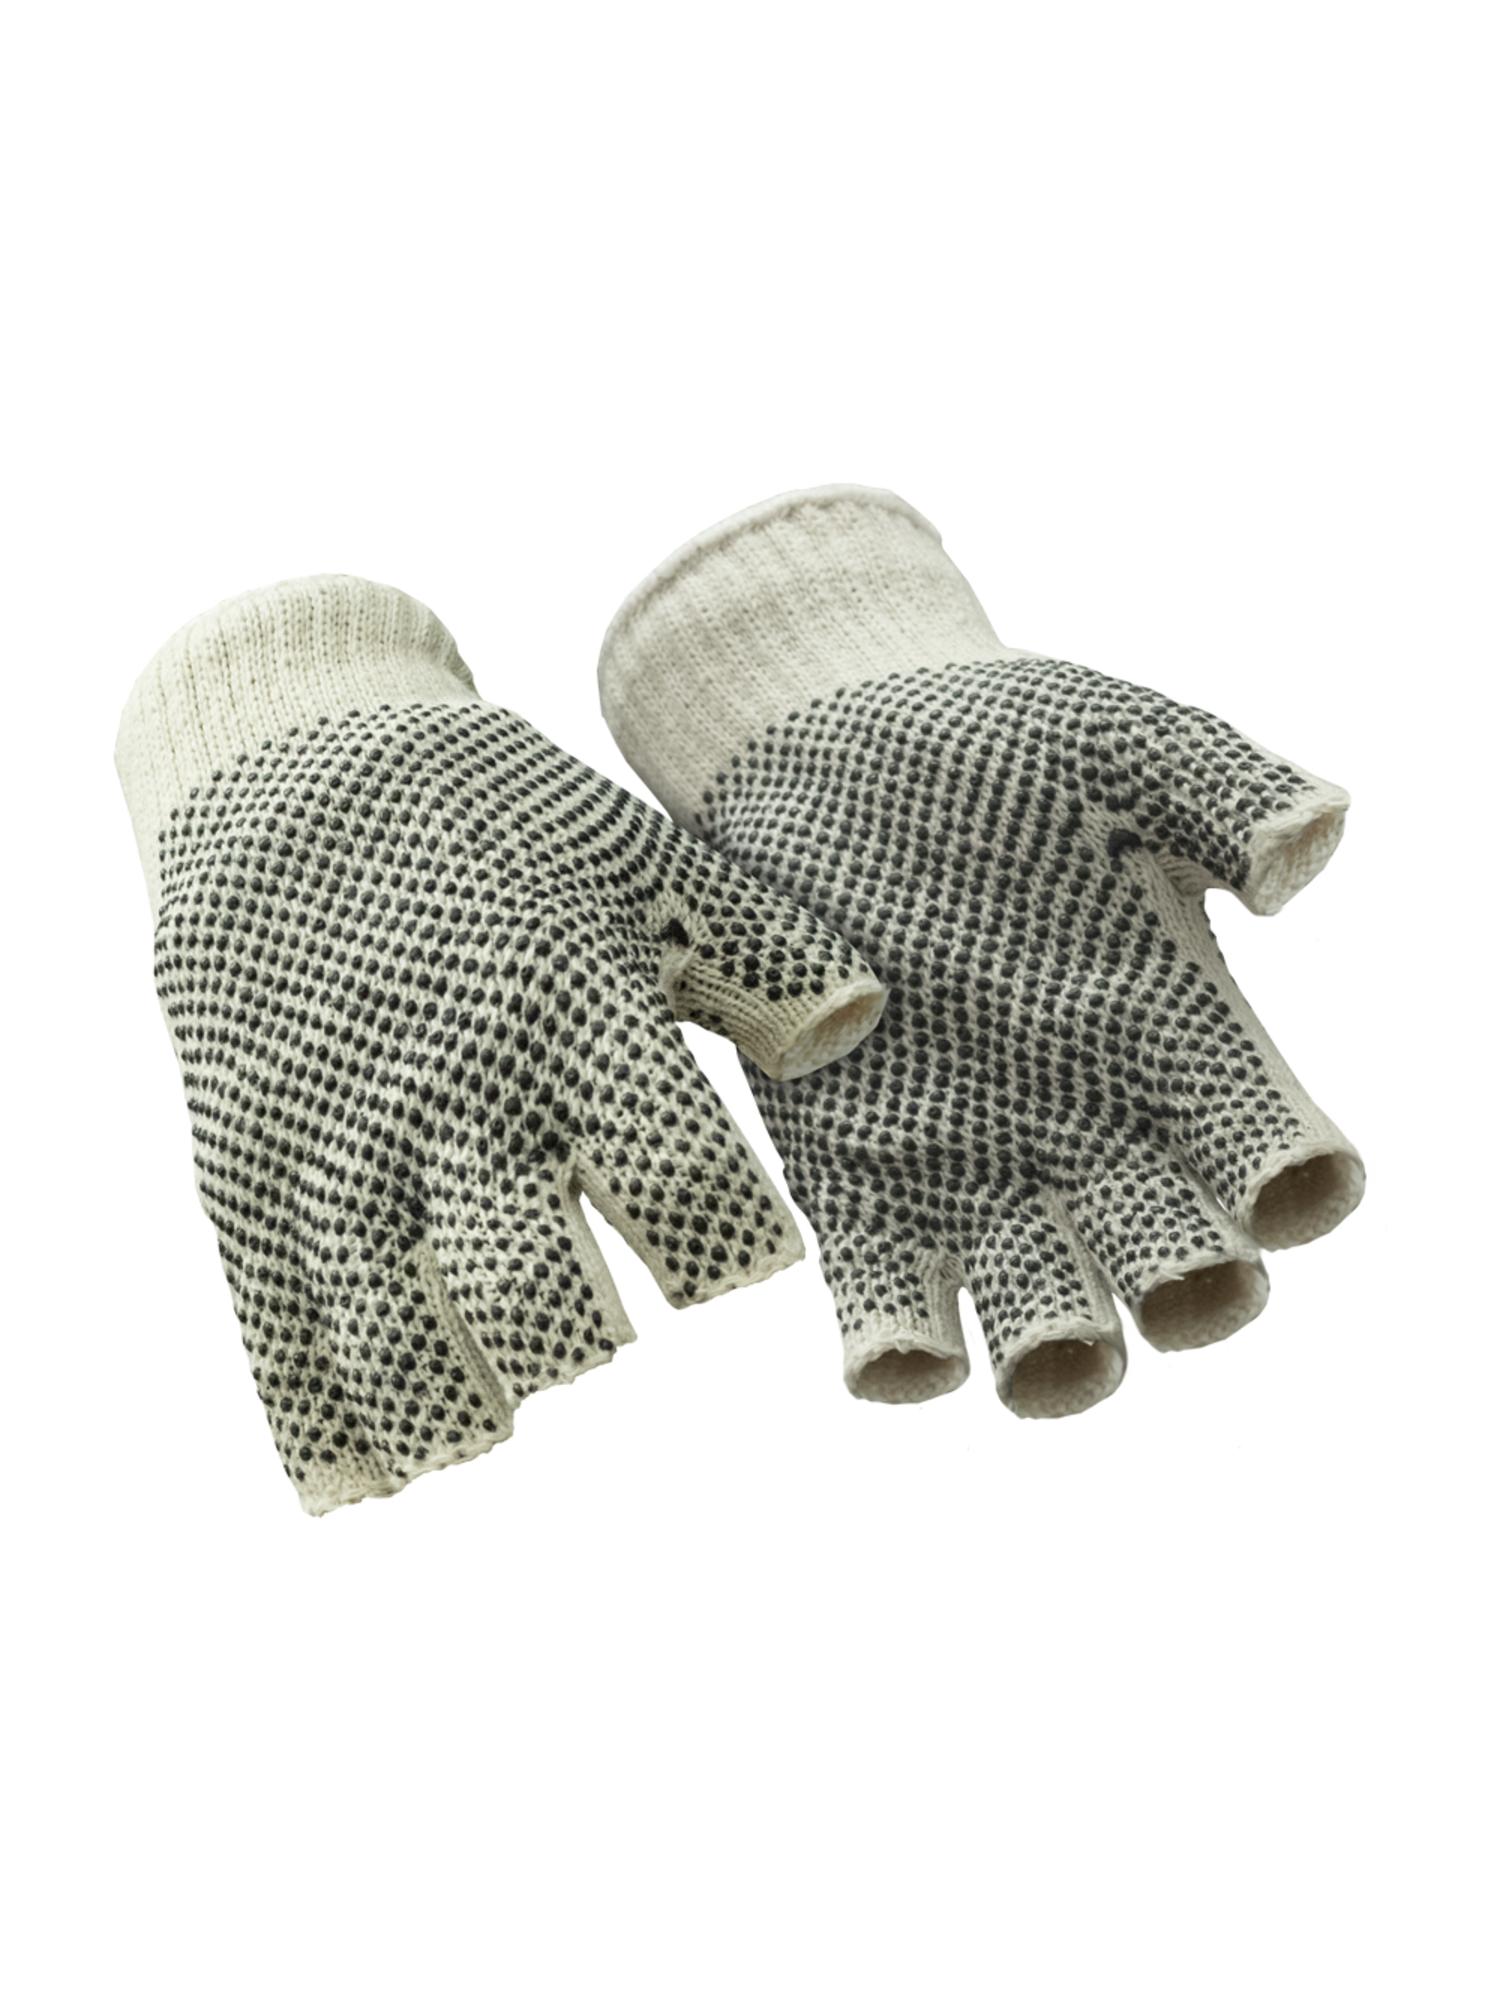 RefrigiWear™ Fingerless Dot Grip Glove , Natural , Large , Polyester/Cotton